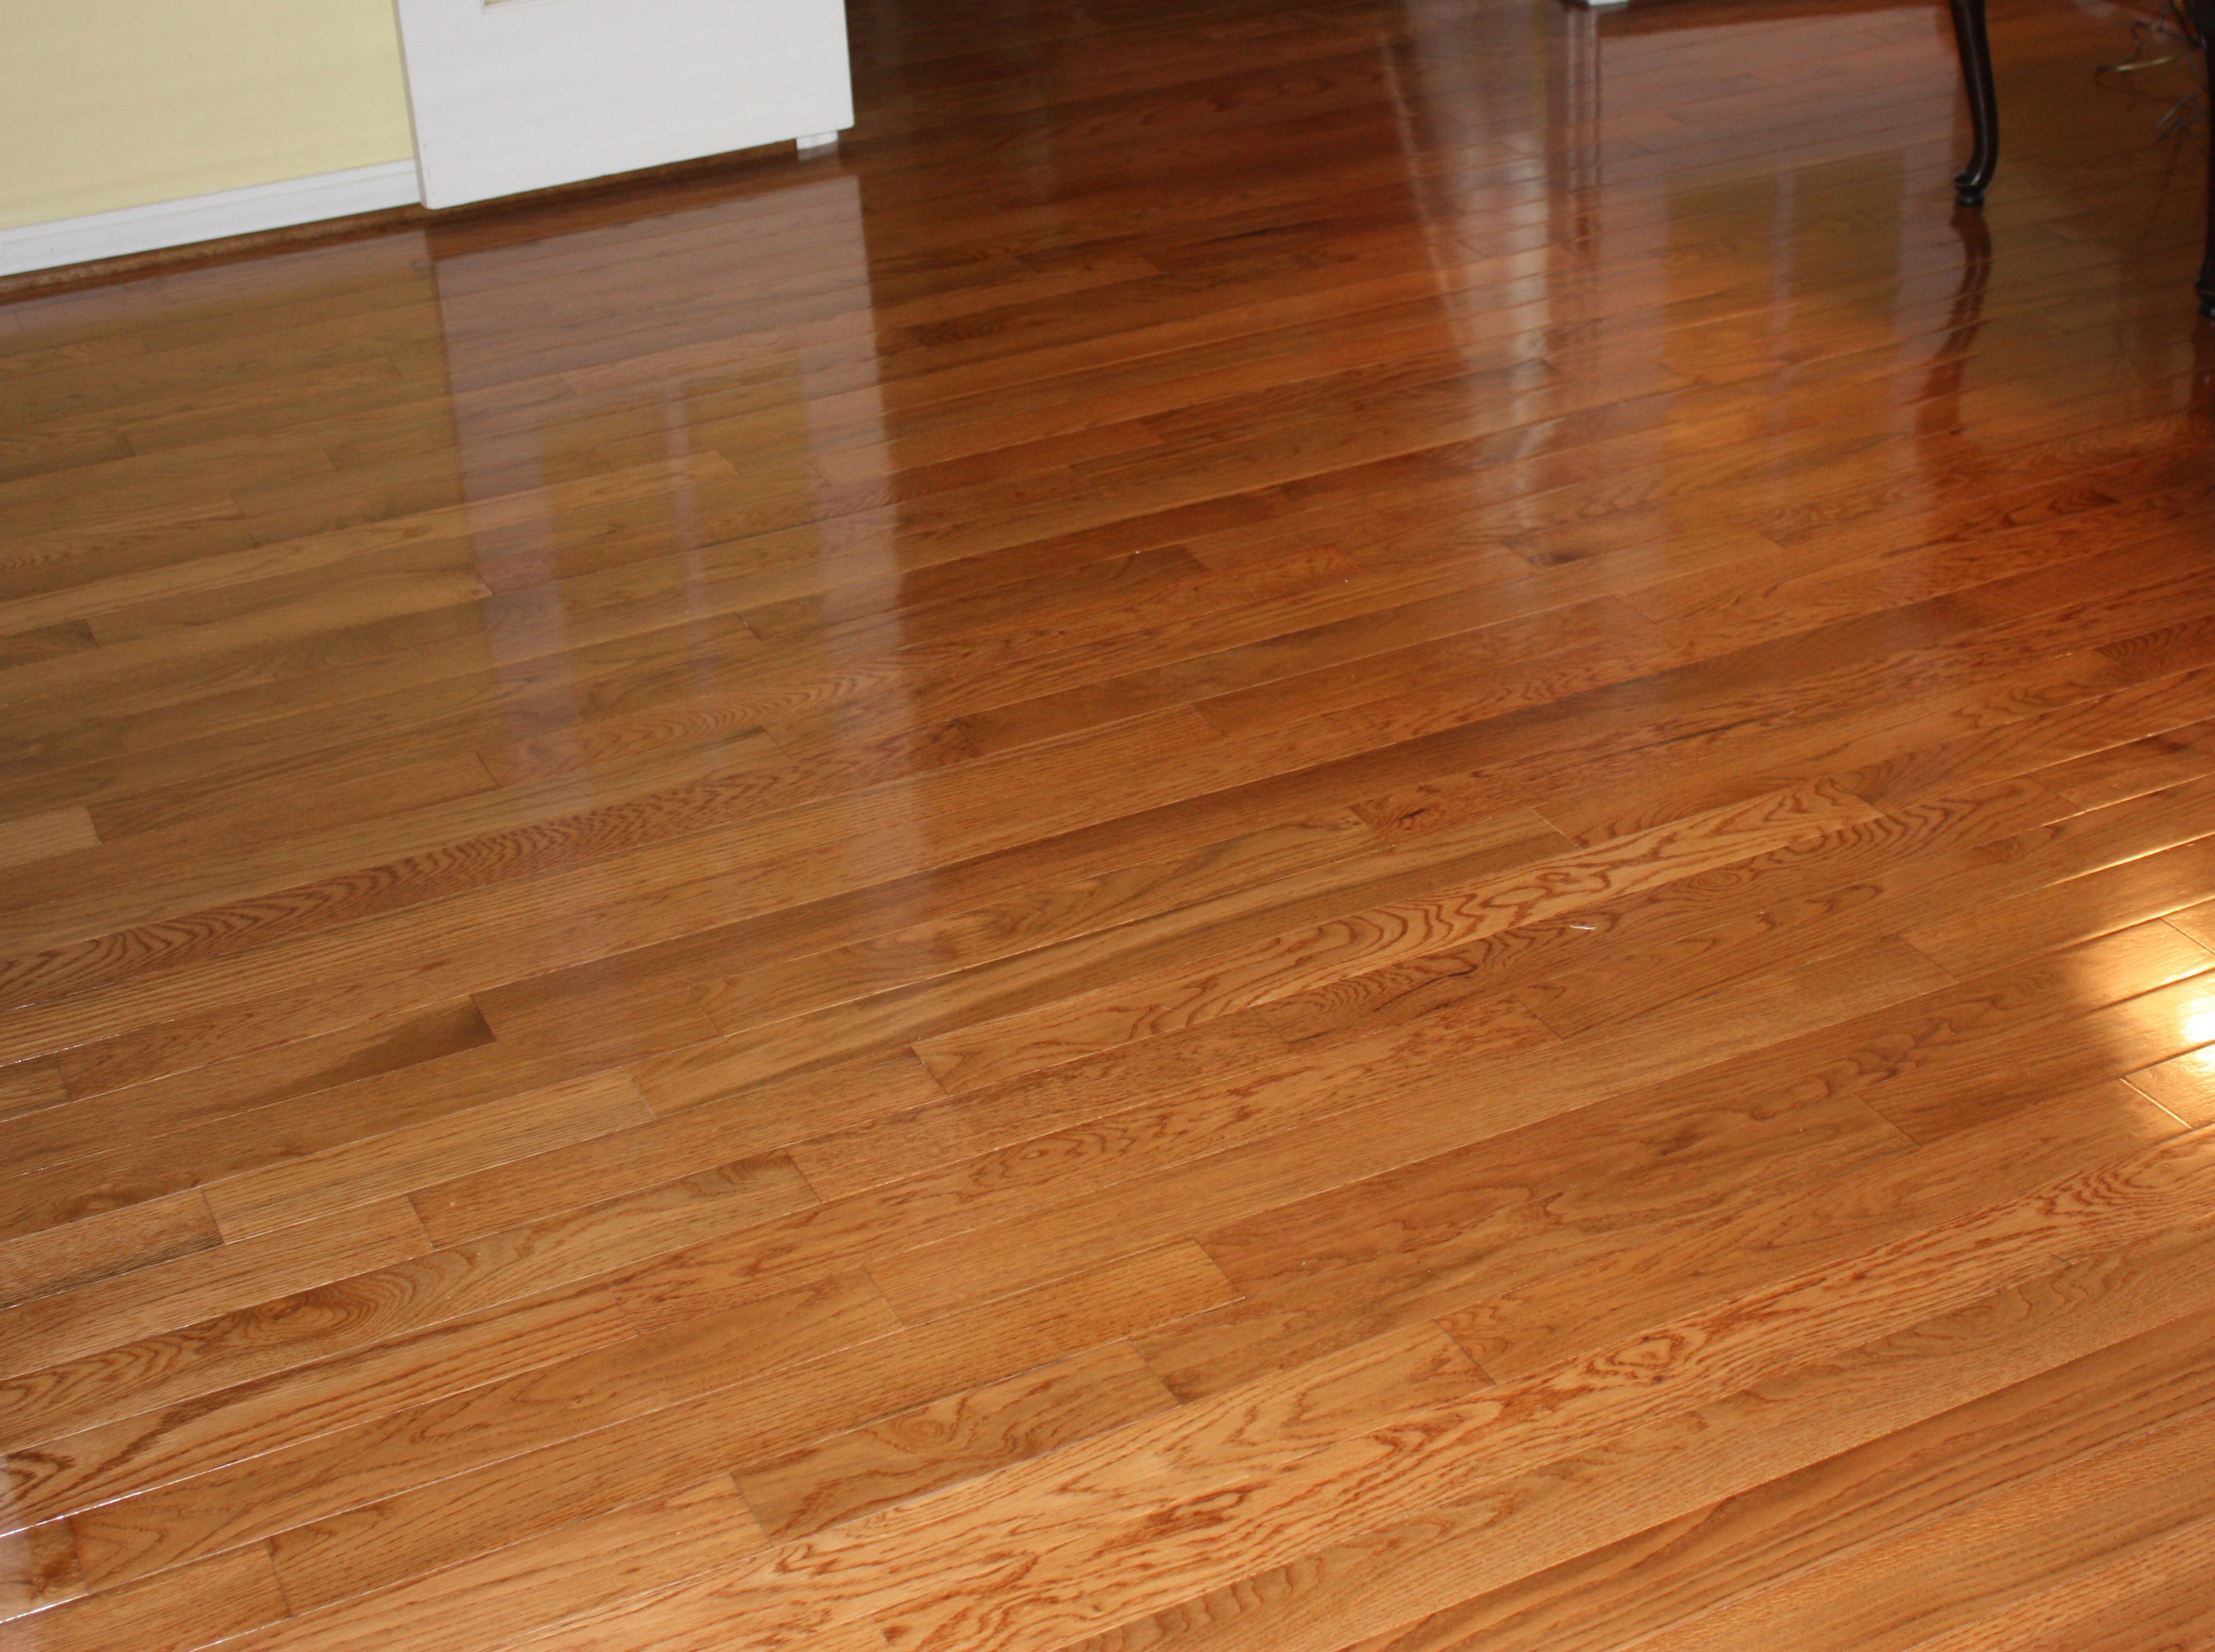 Best Floor For Dogs Laminate